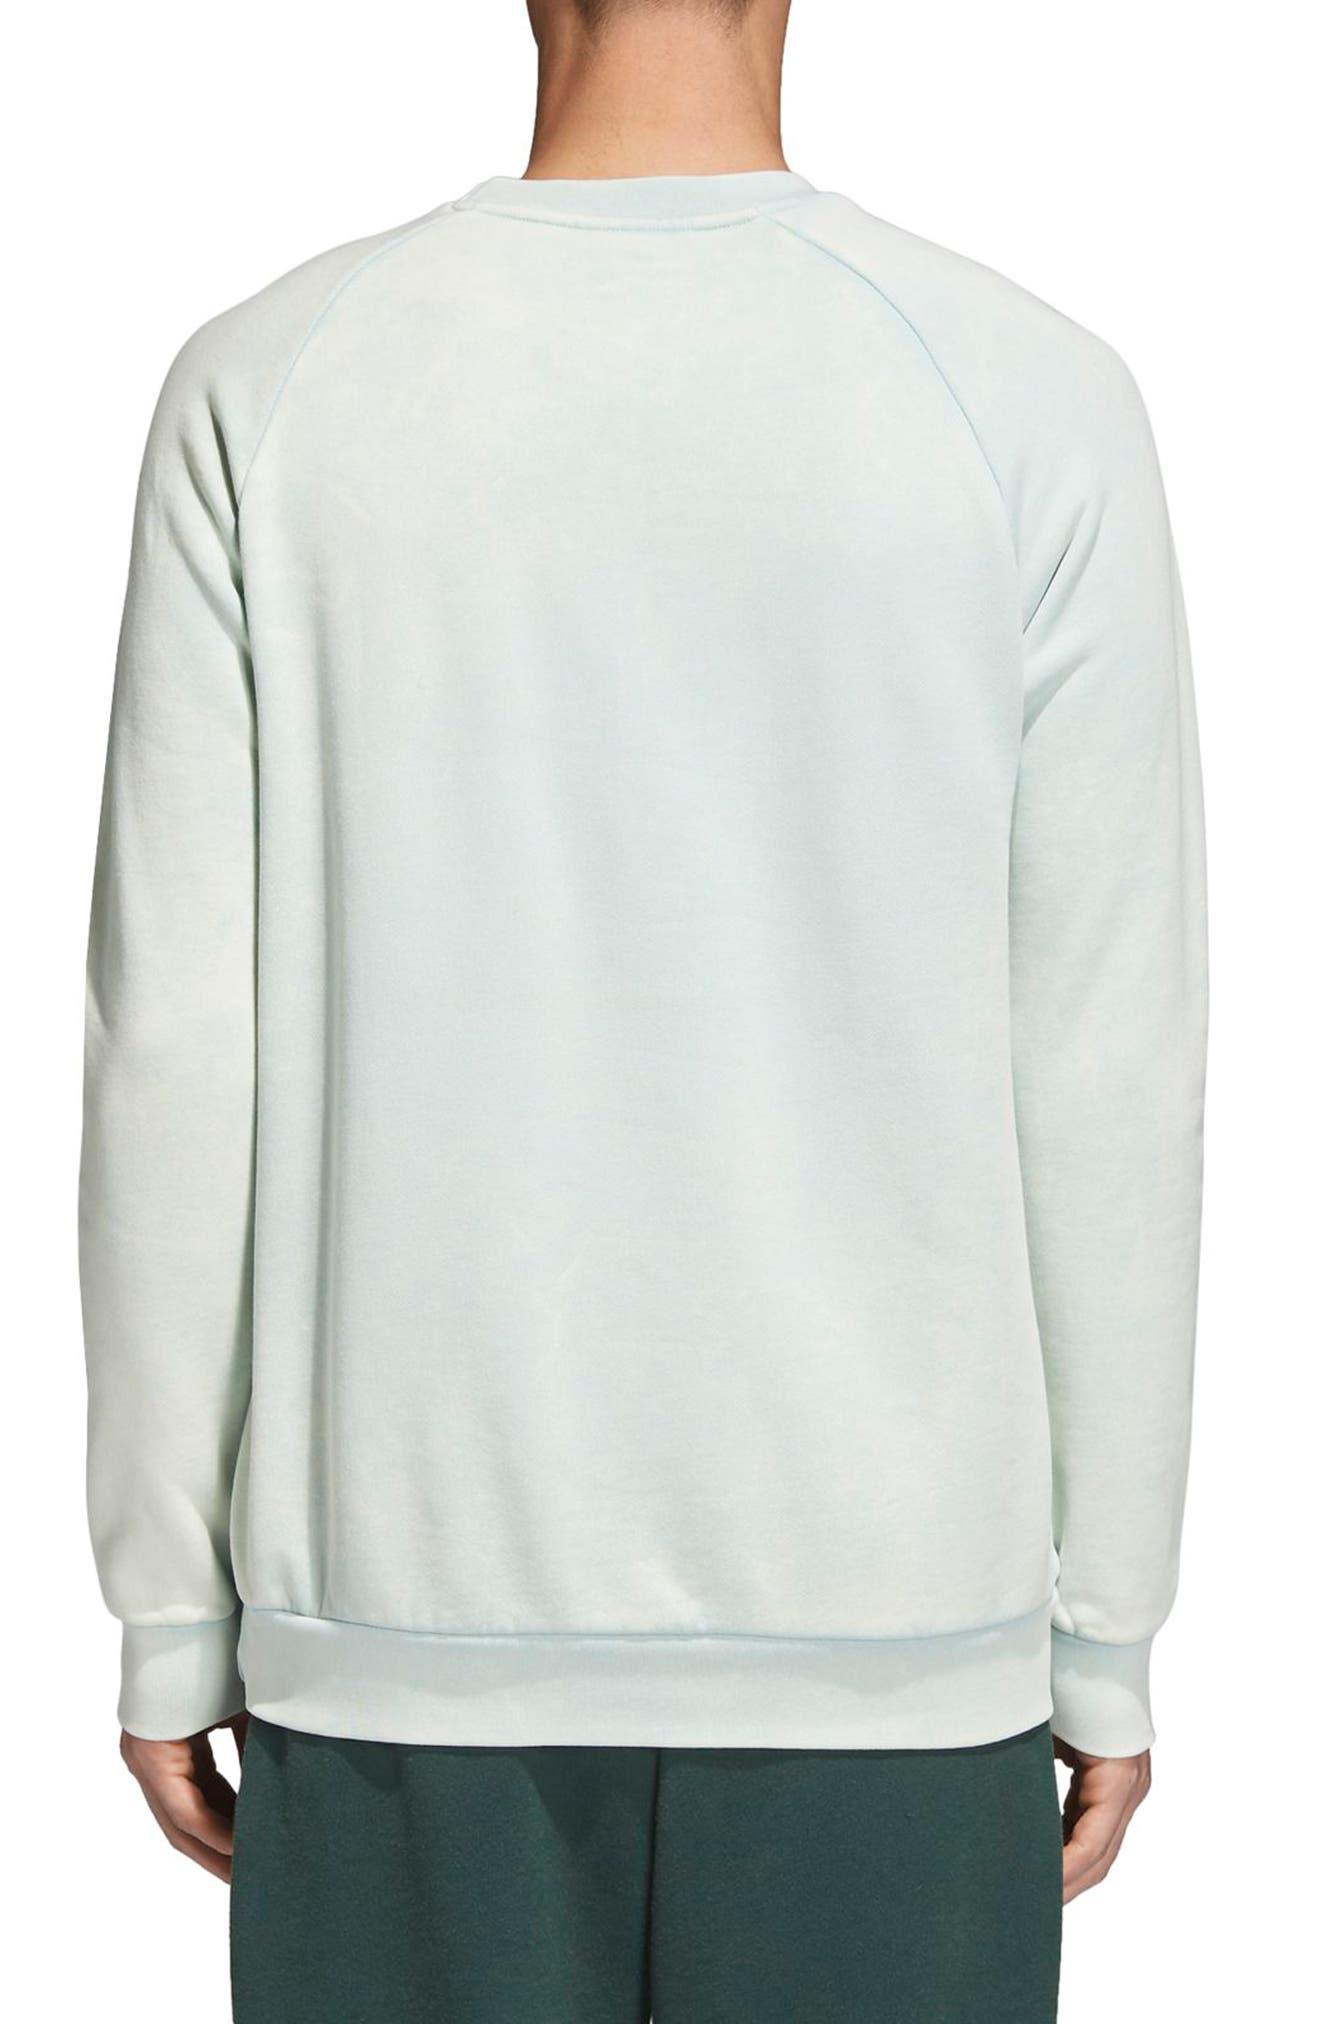 Trefoil Crewneck Sweatshirt,                             Alternate thumbnail 2, color,                             339